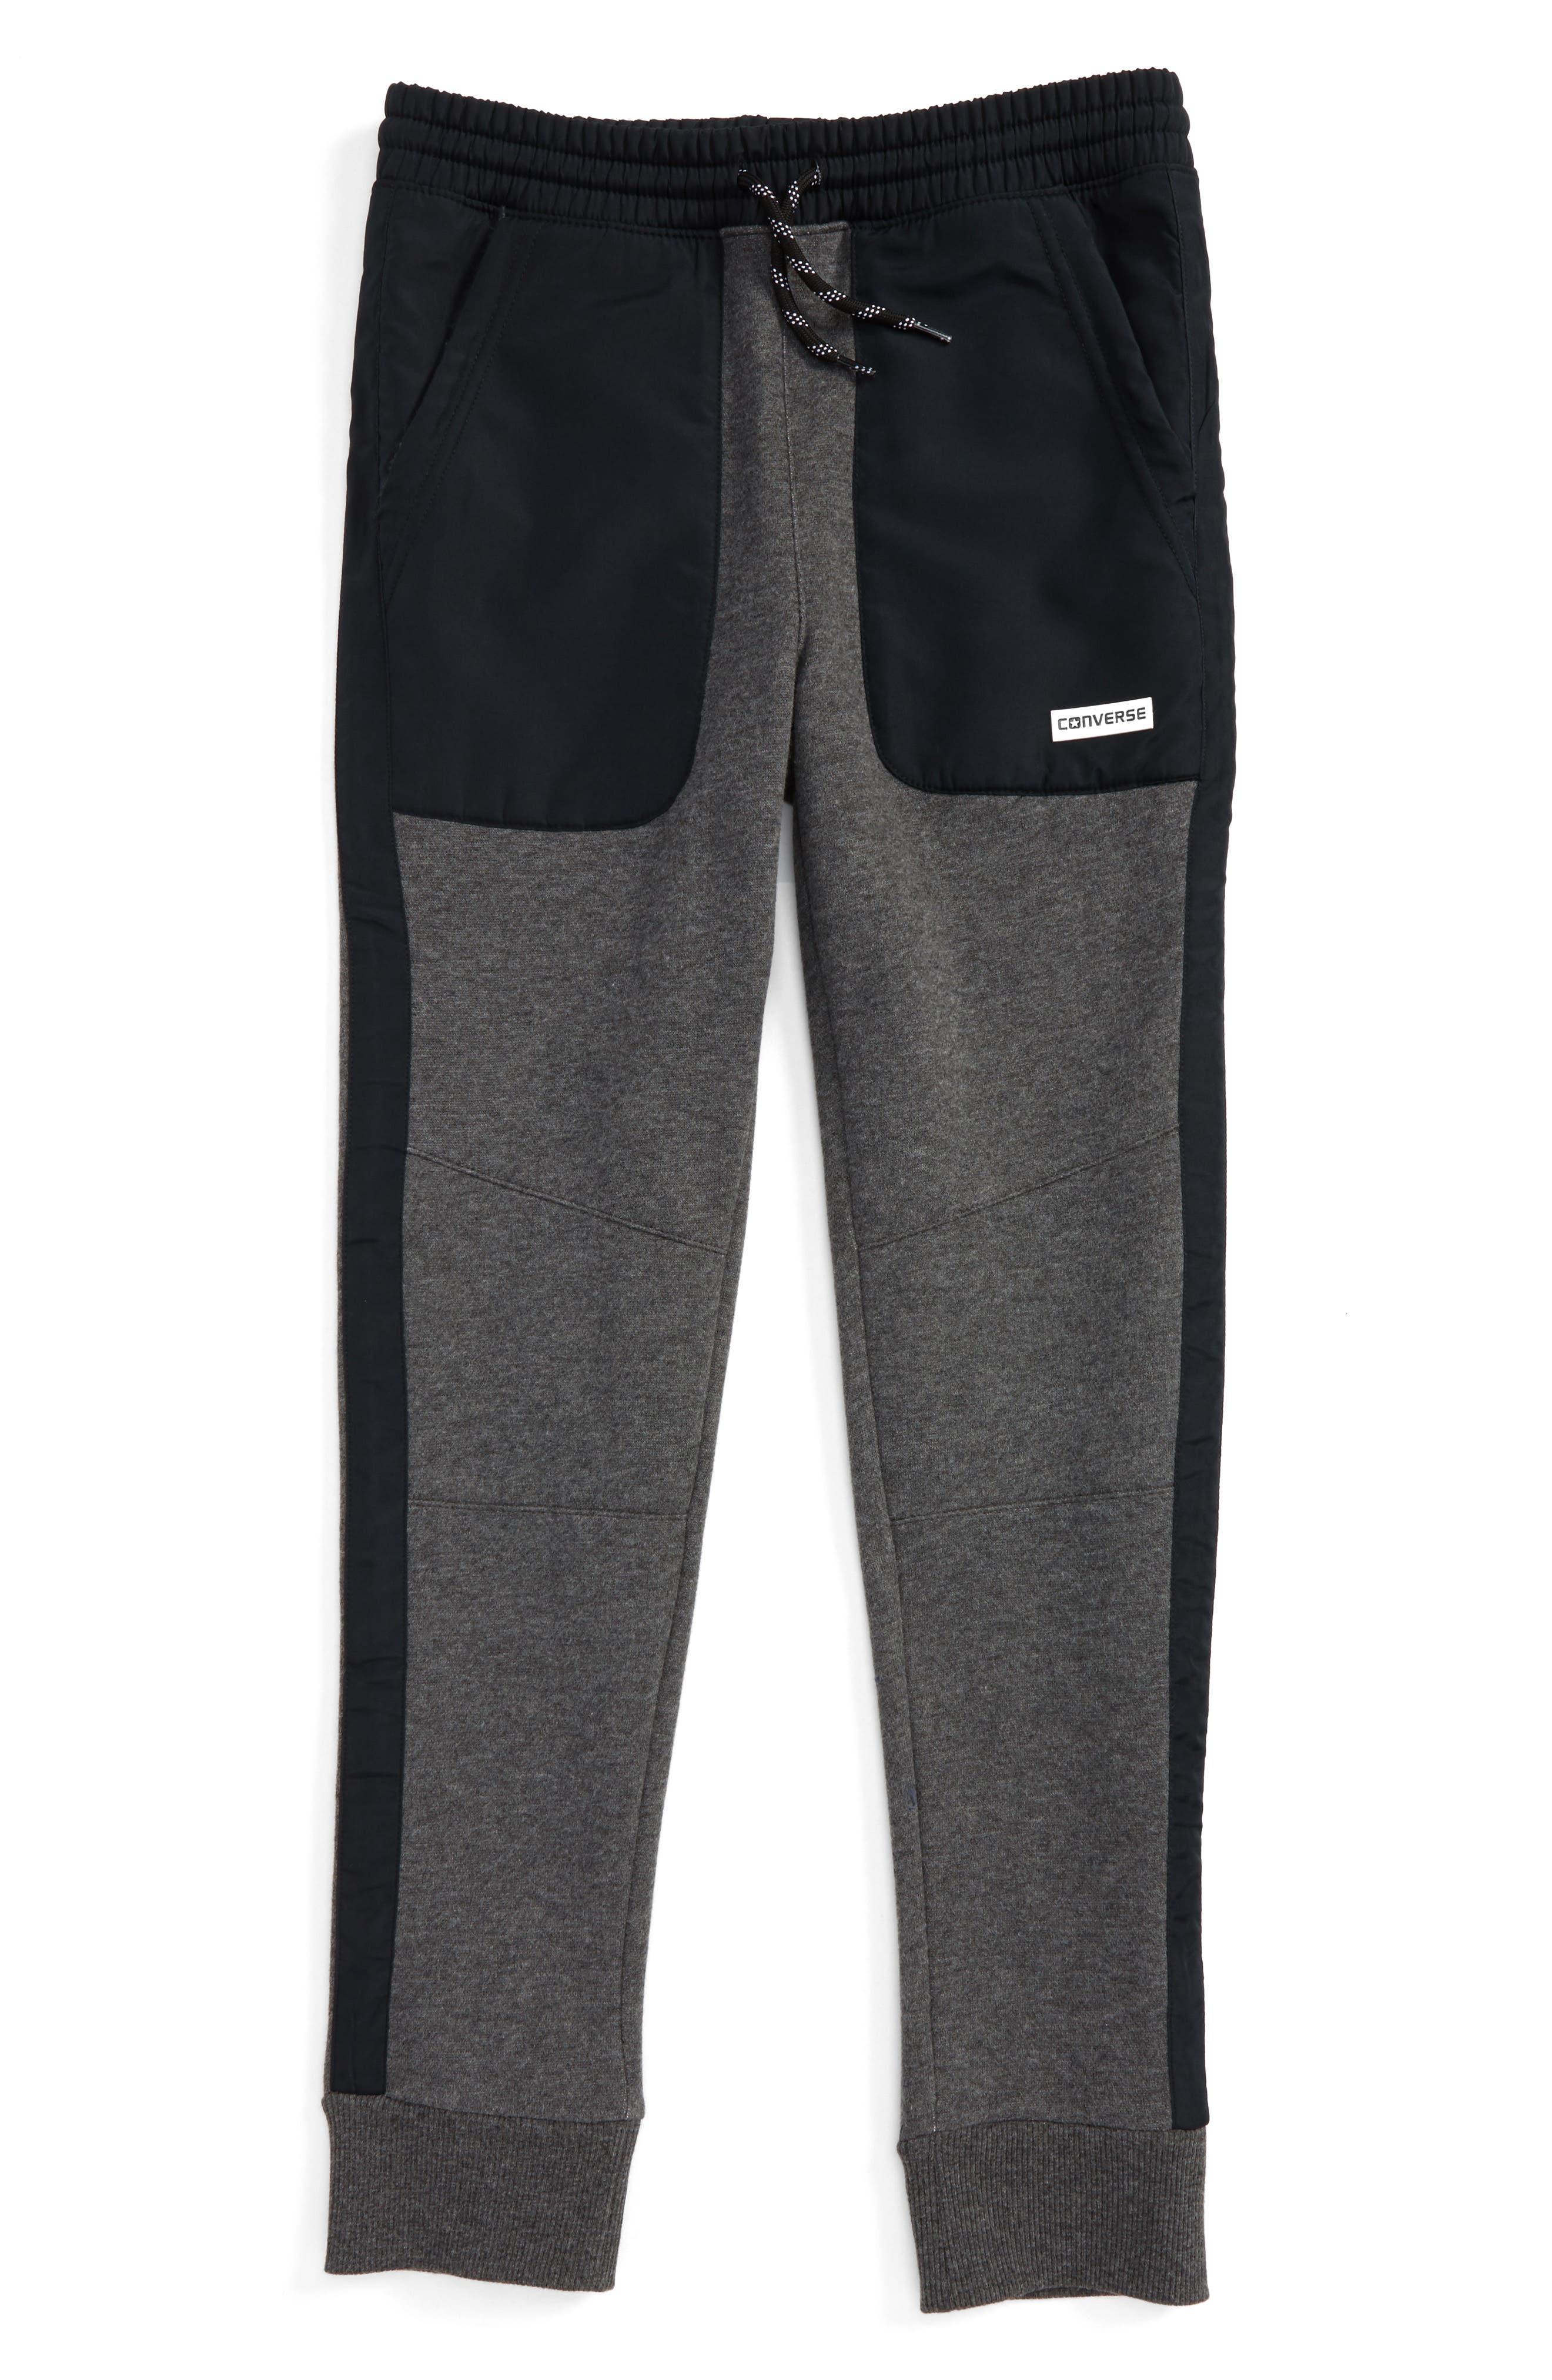 CONVERSE Knit & Woven Fashion Jogger Pants